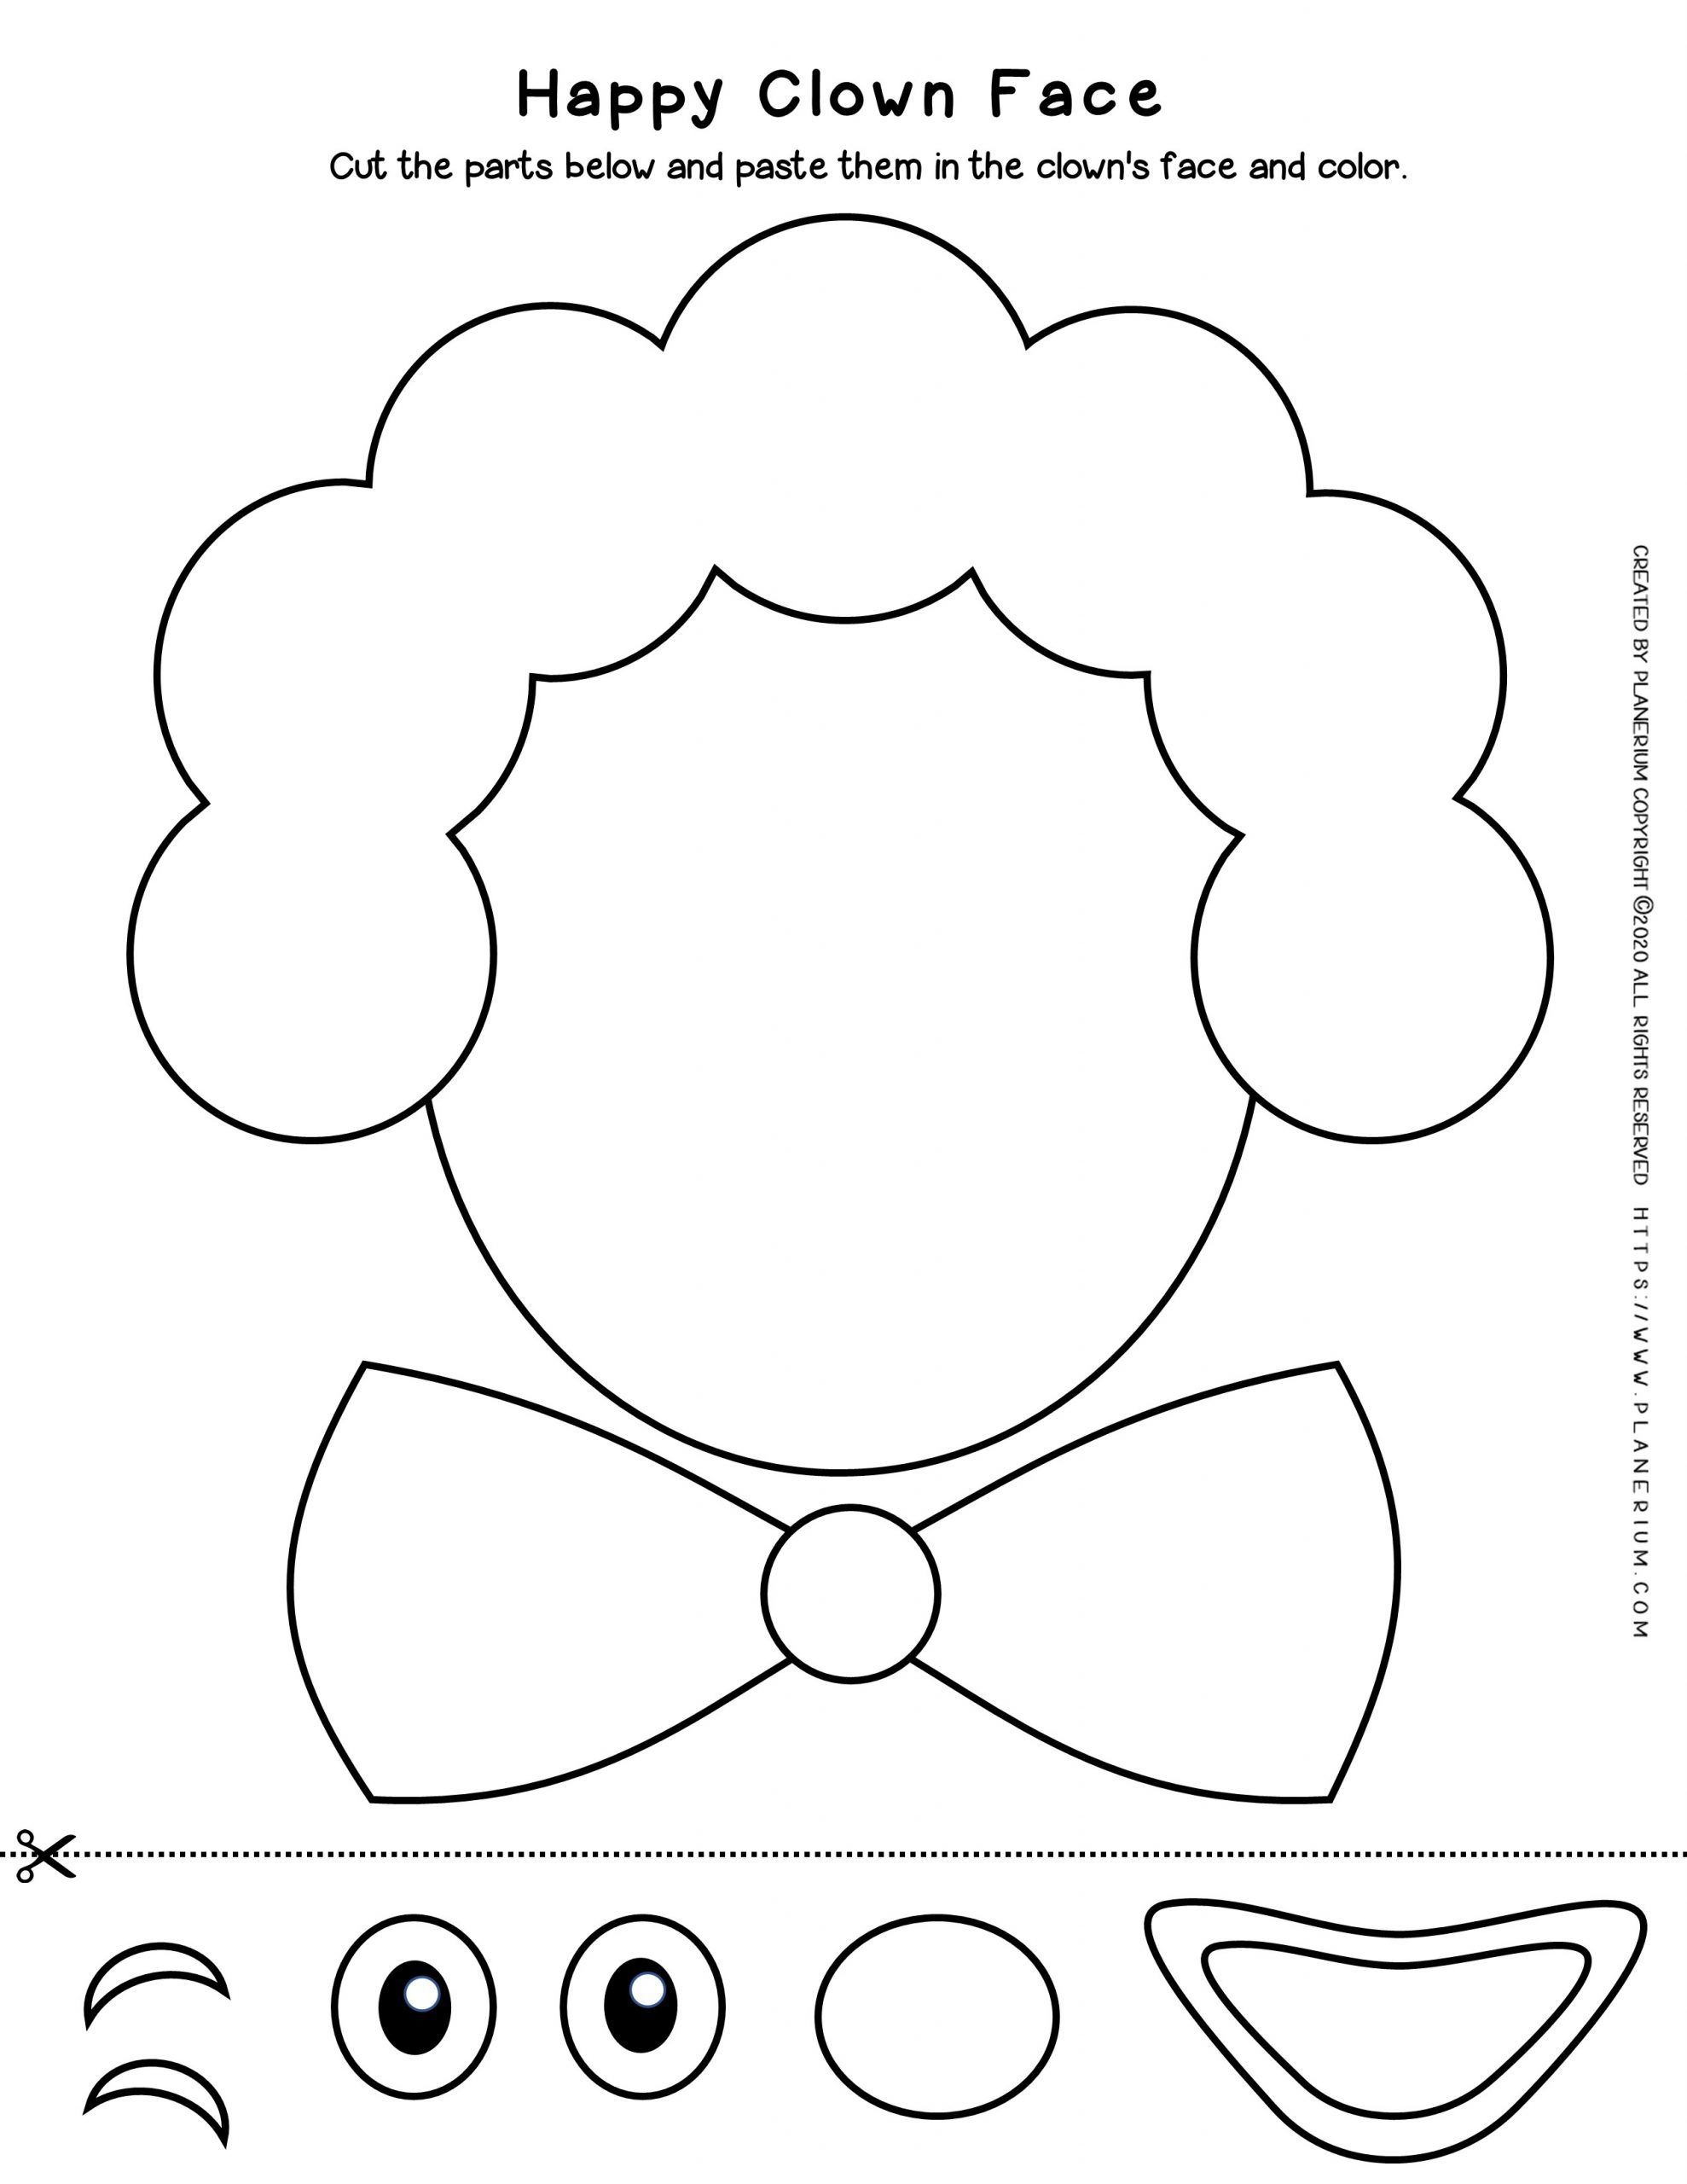 Carnival - Coloring Page Worksheet - Clown Cut Paste | Planerium